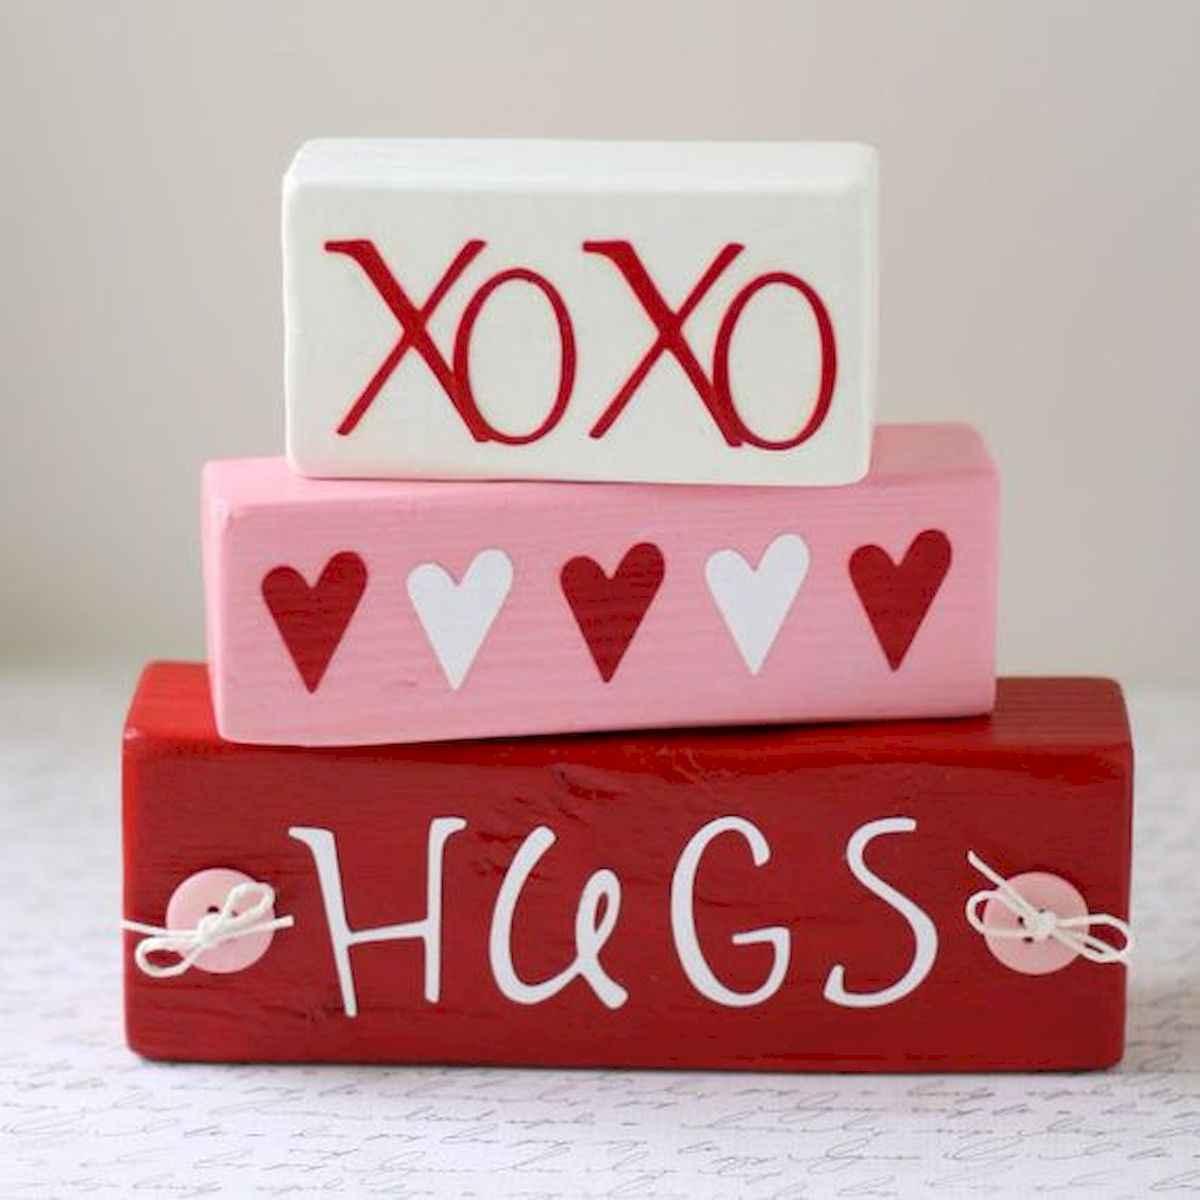 75 lovely valentines day crafts design ideas (41)